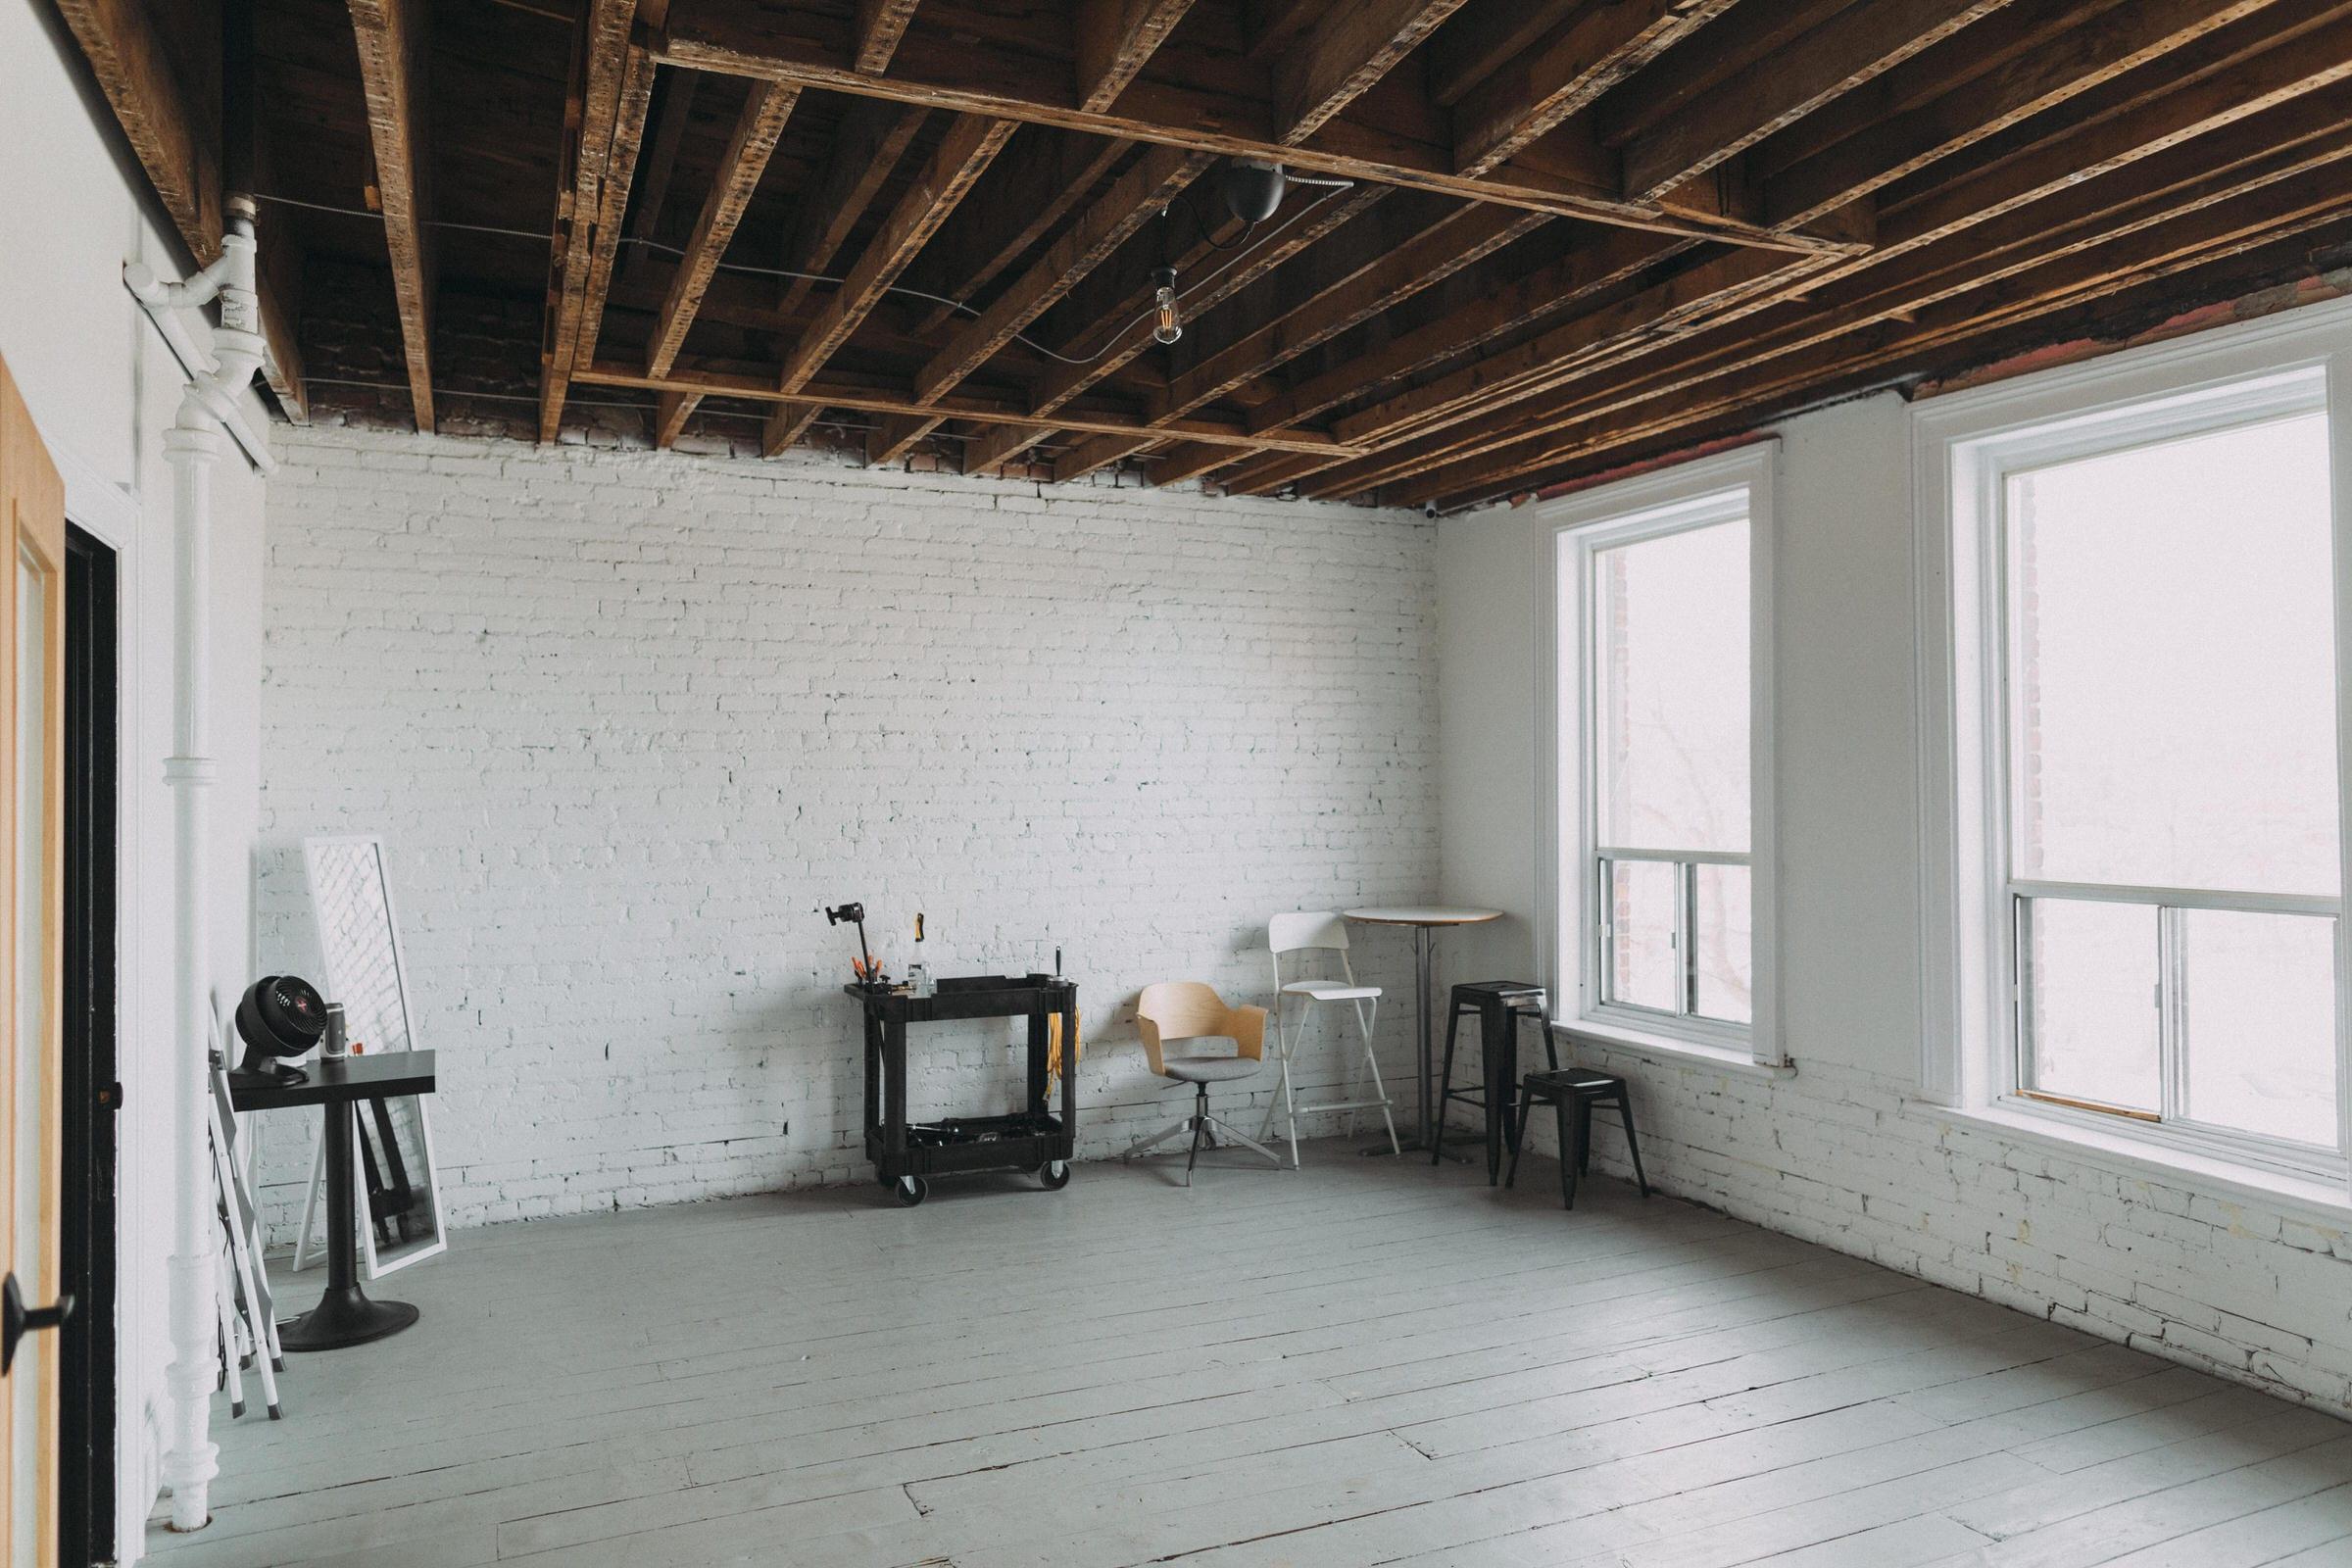 Whitby photography studio